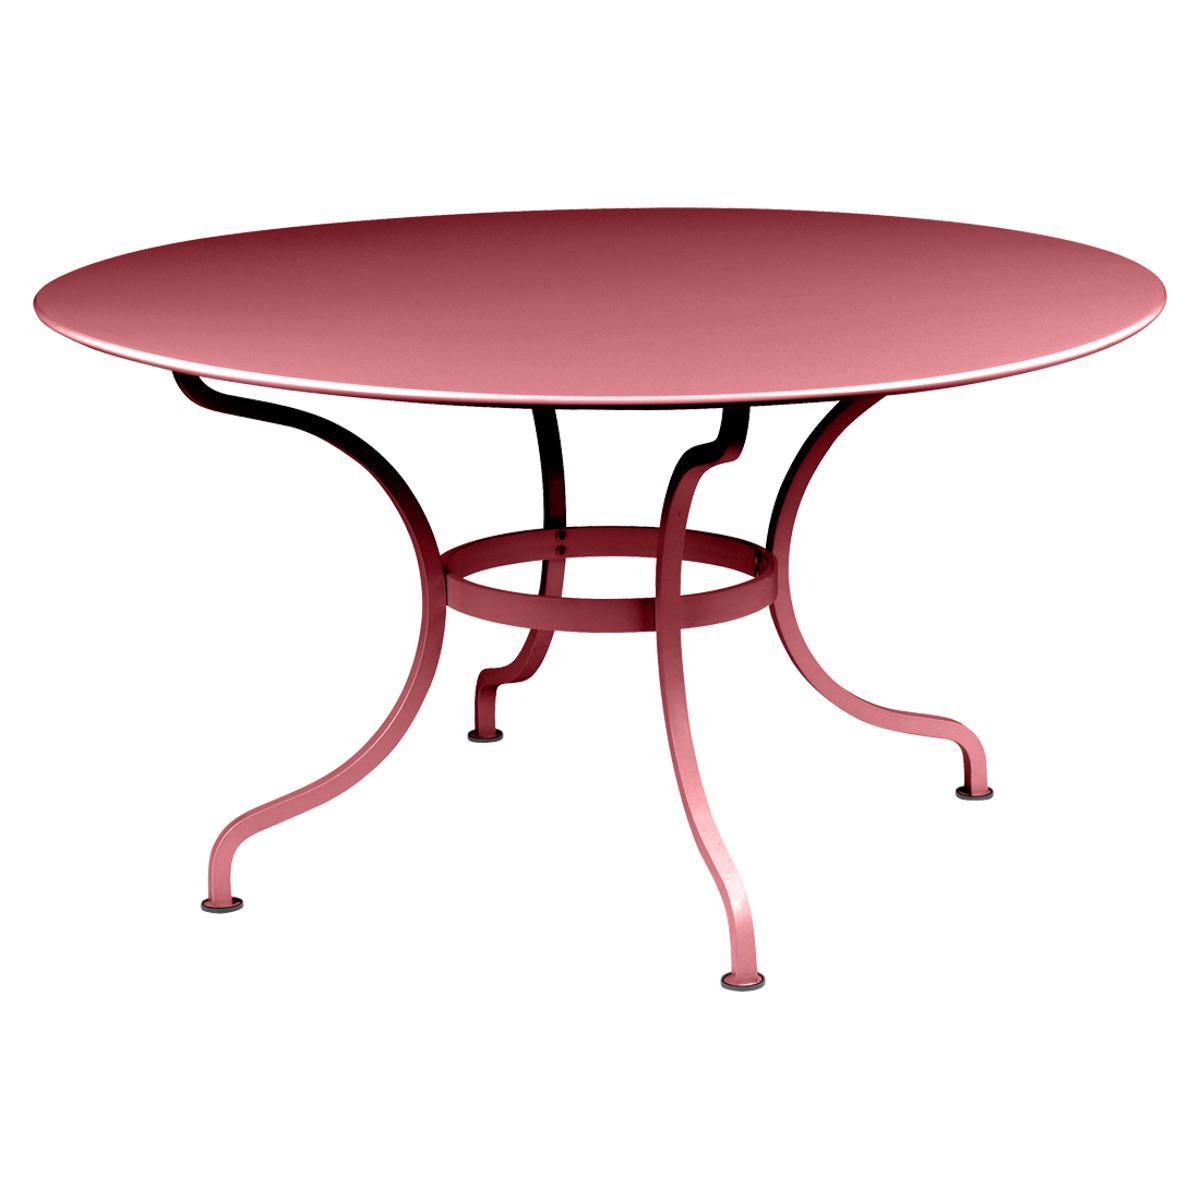 Table ronde 137cm ROMANE Fermob piment